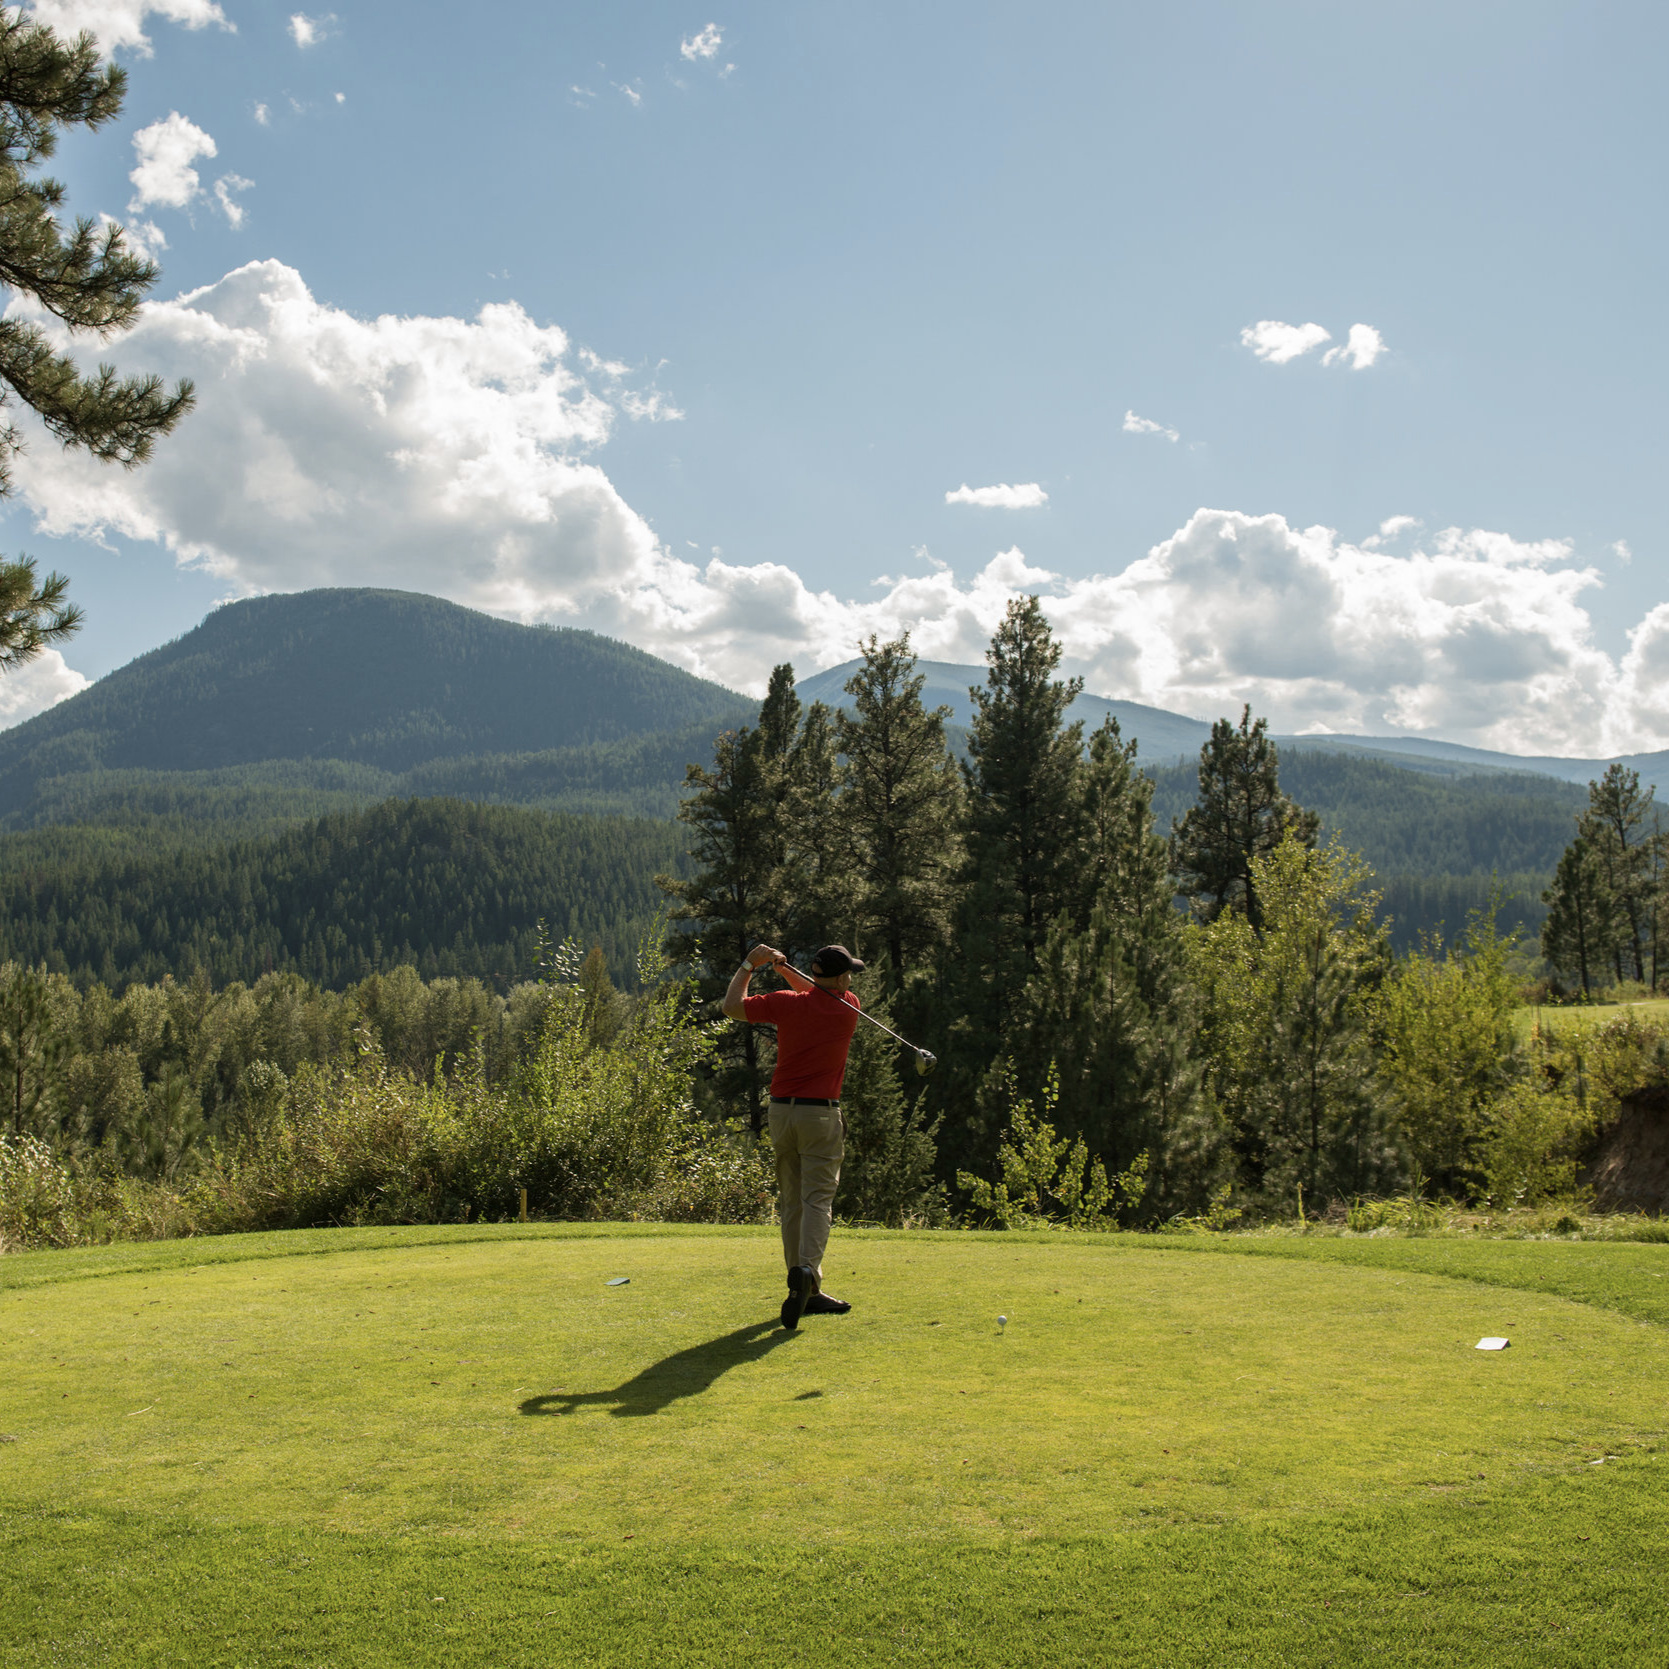 Photo by Pat Bates | Bootleg Gap Golf Course